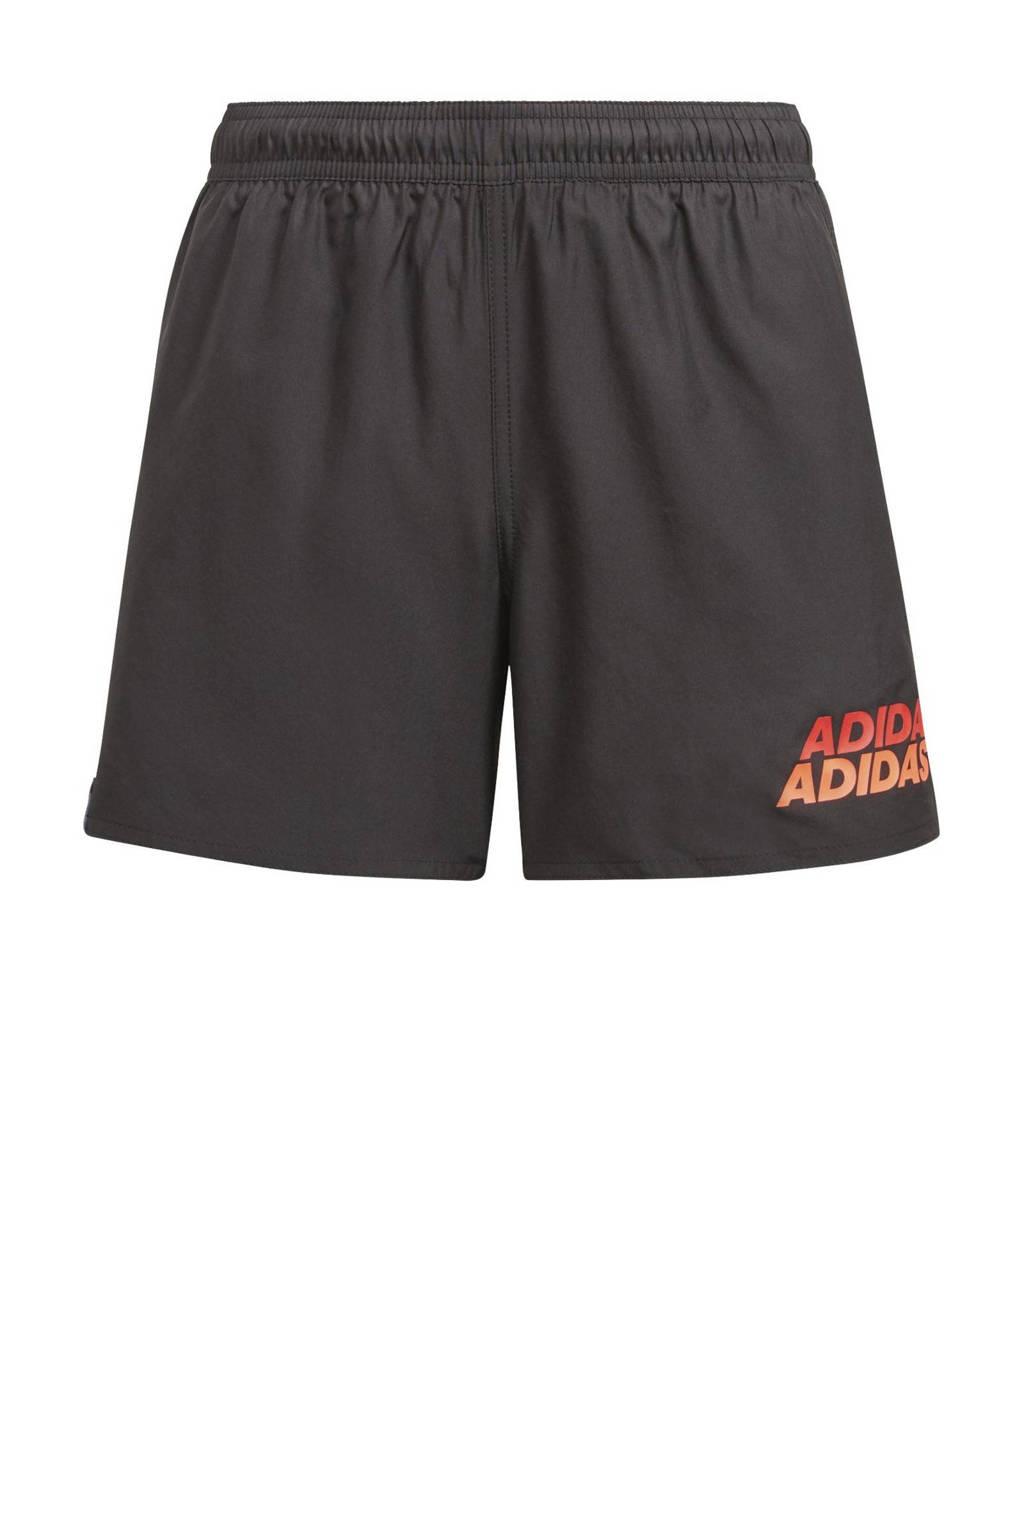 adidas Performance zwemshort zwart/rood, Zwart/rood